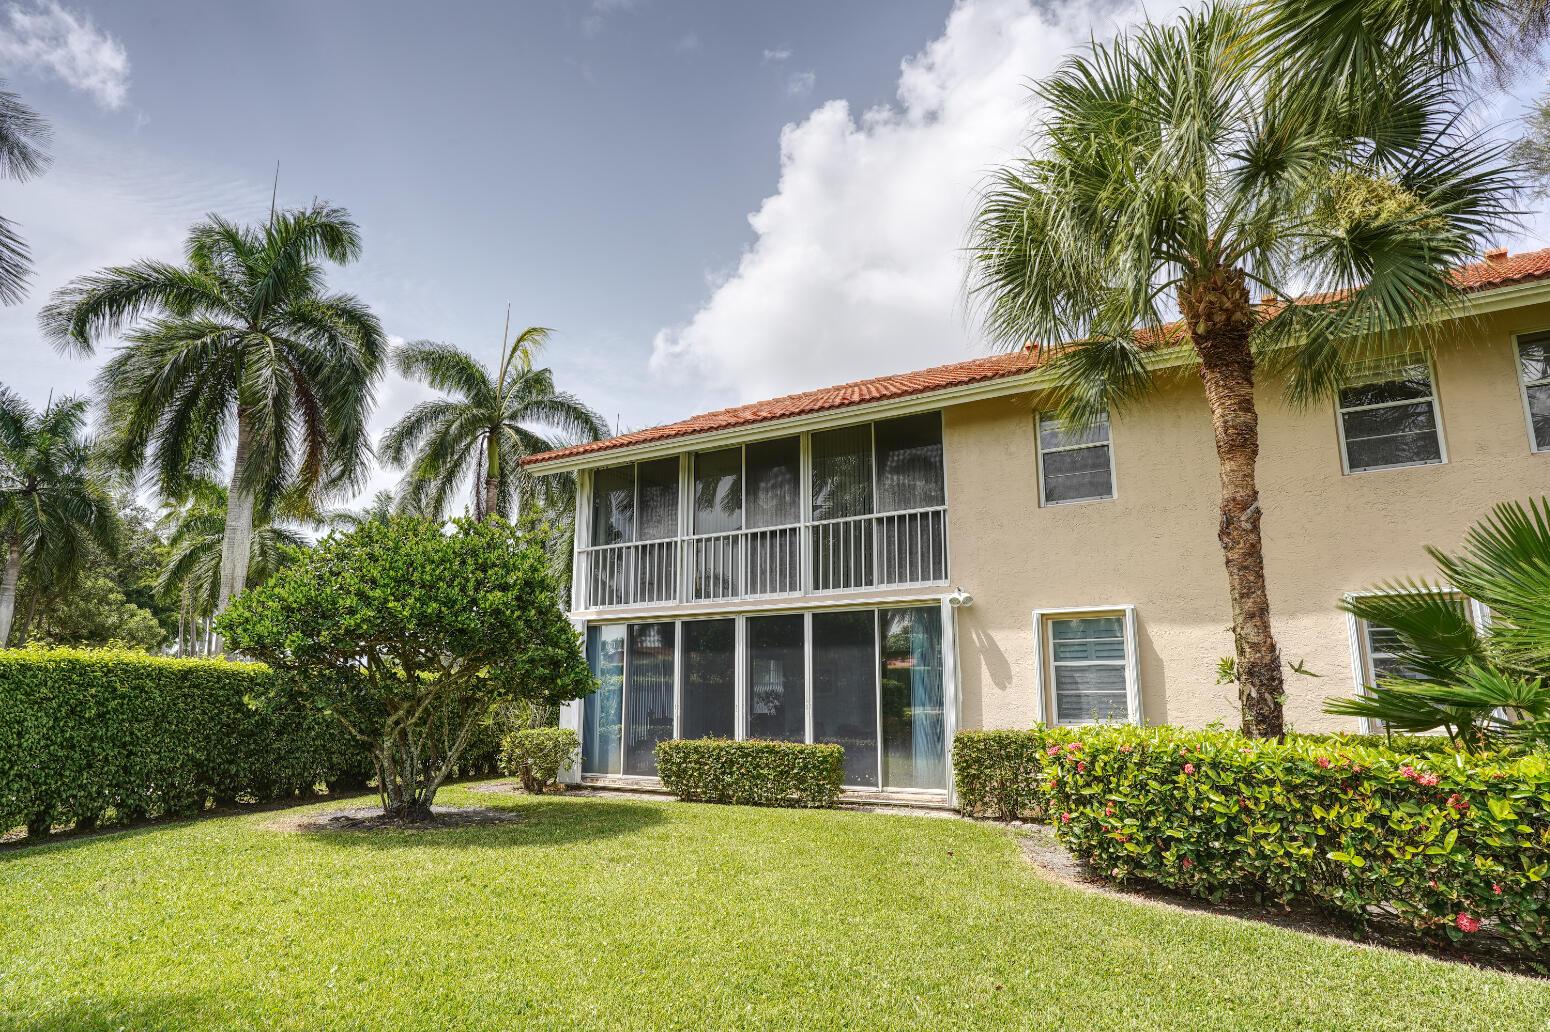 Photo of 7015 Summer Tree 202 Drive #202, Boynton Beach, FL 33437